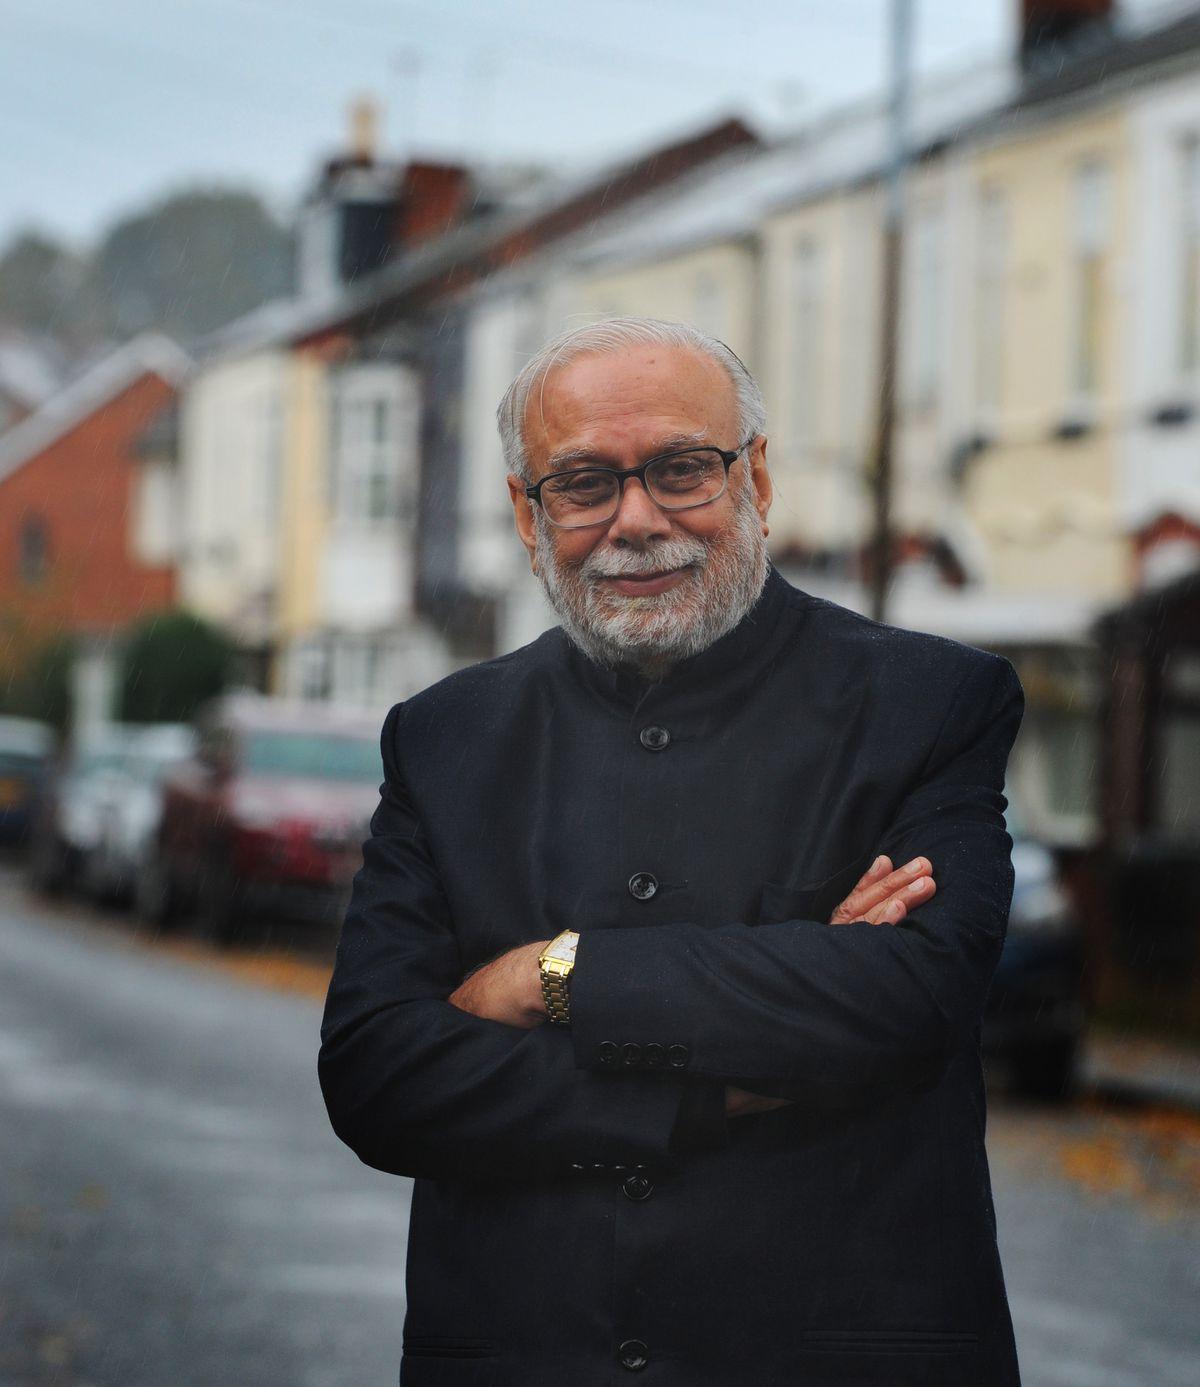 Harmohinder Singh Bhatia